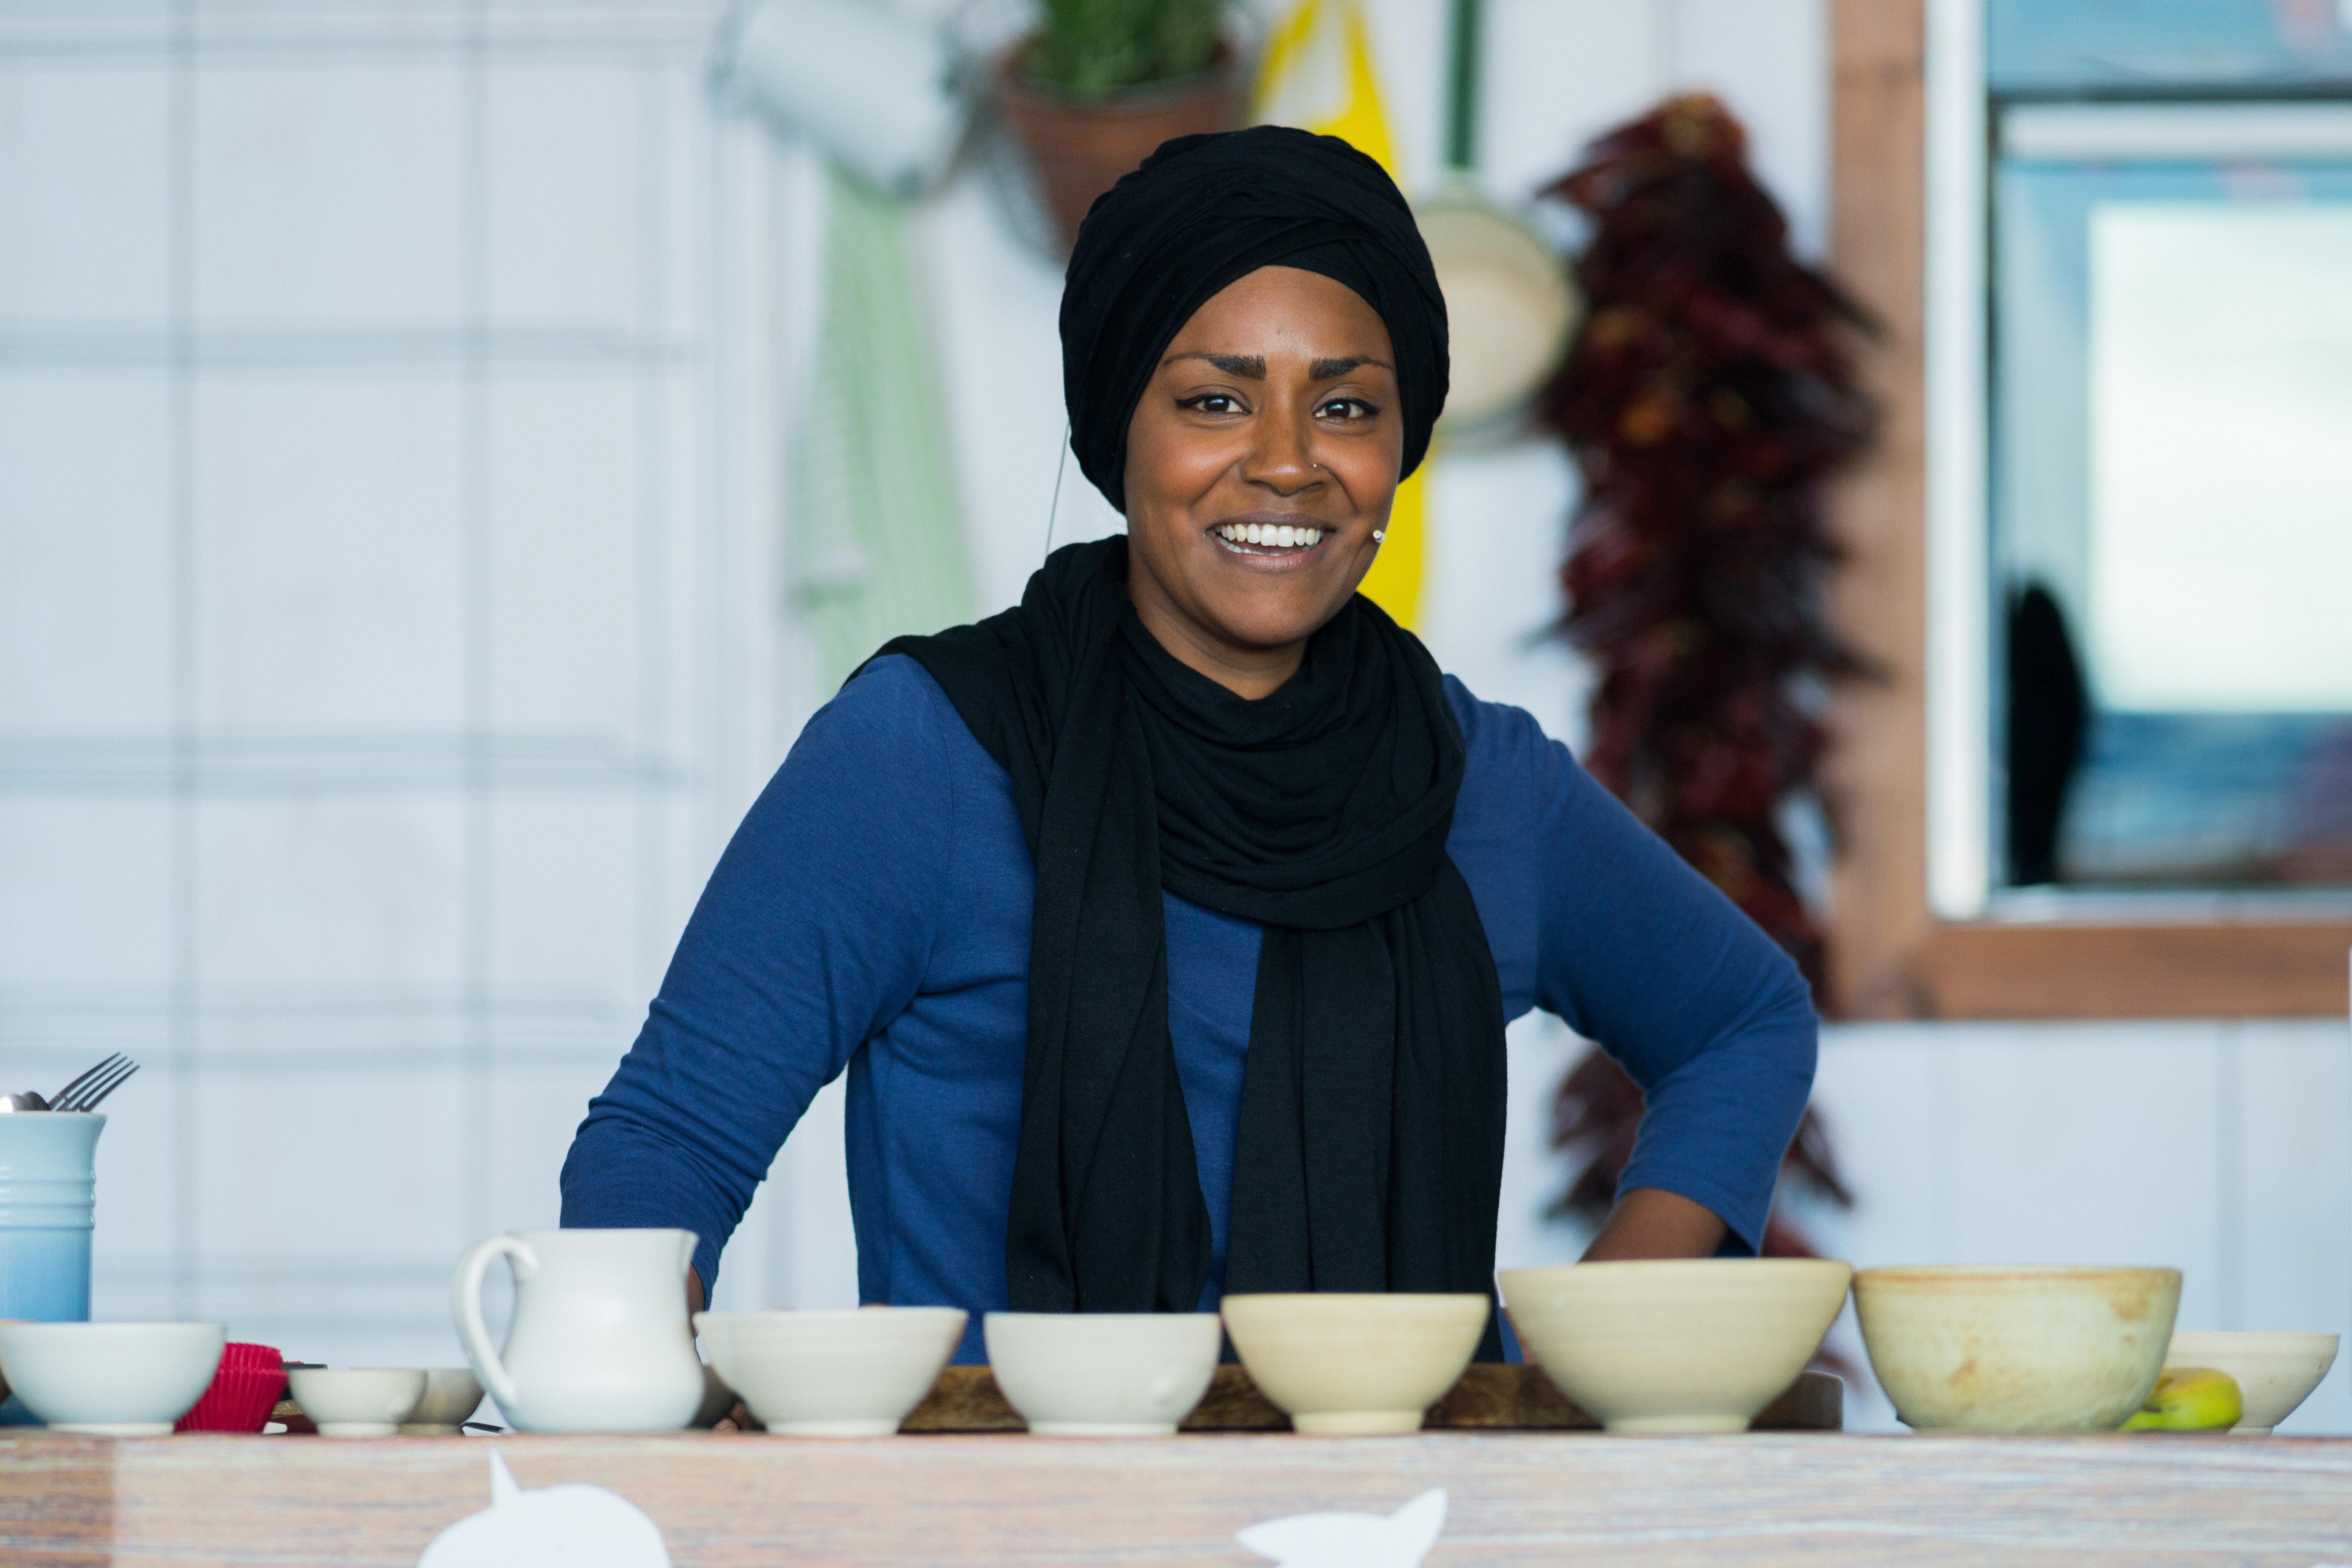 'Great British Bake Off' Winner Nadiya Hussain Finally Bags Her Own BBC Cooking